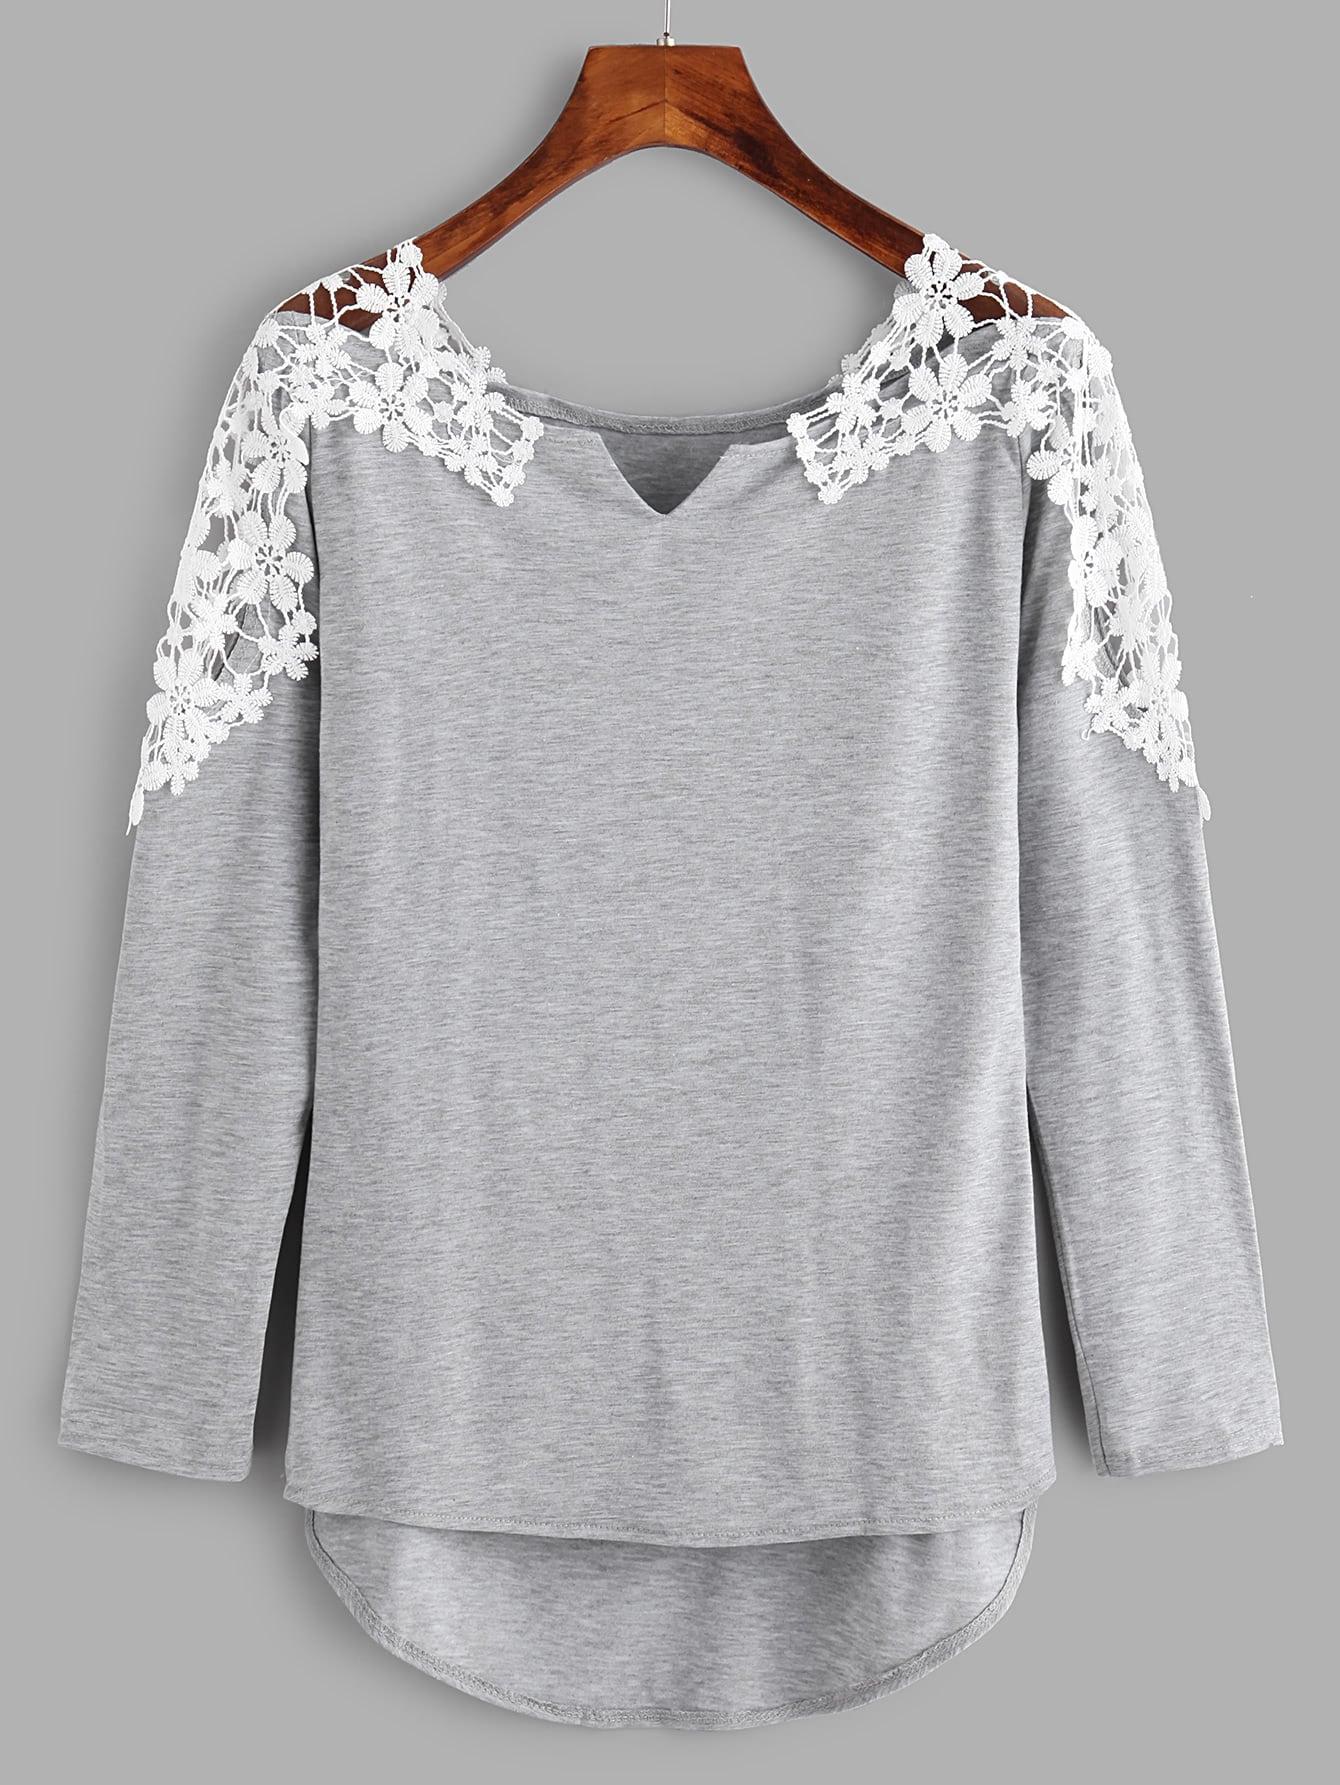 Contrast Crochet V Cut High Low Marled Tee tee171116303